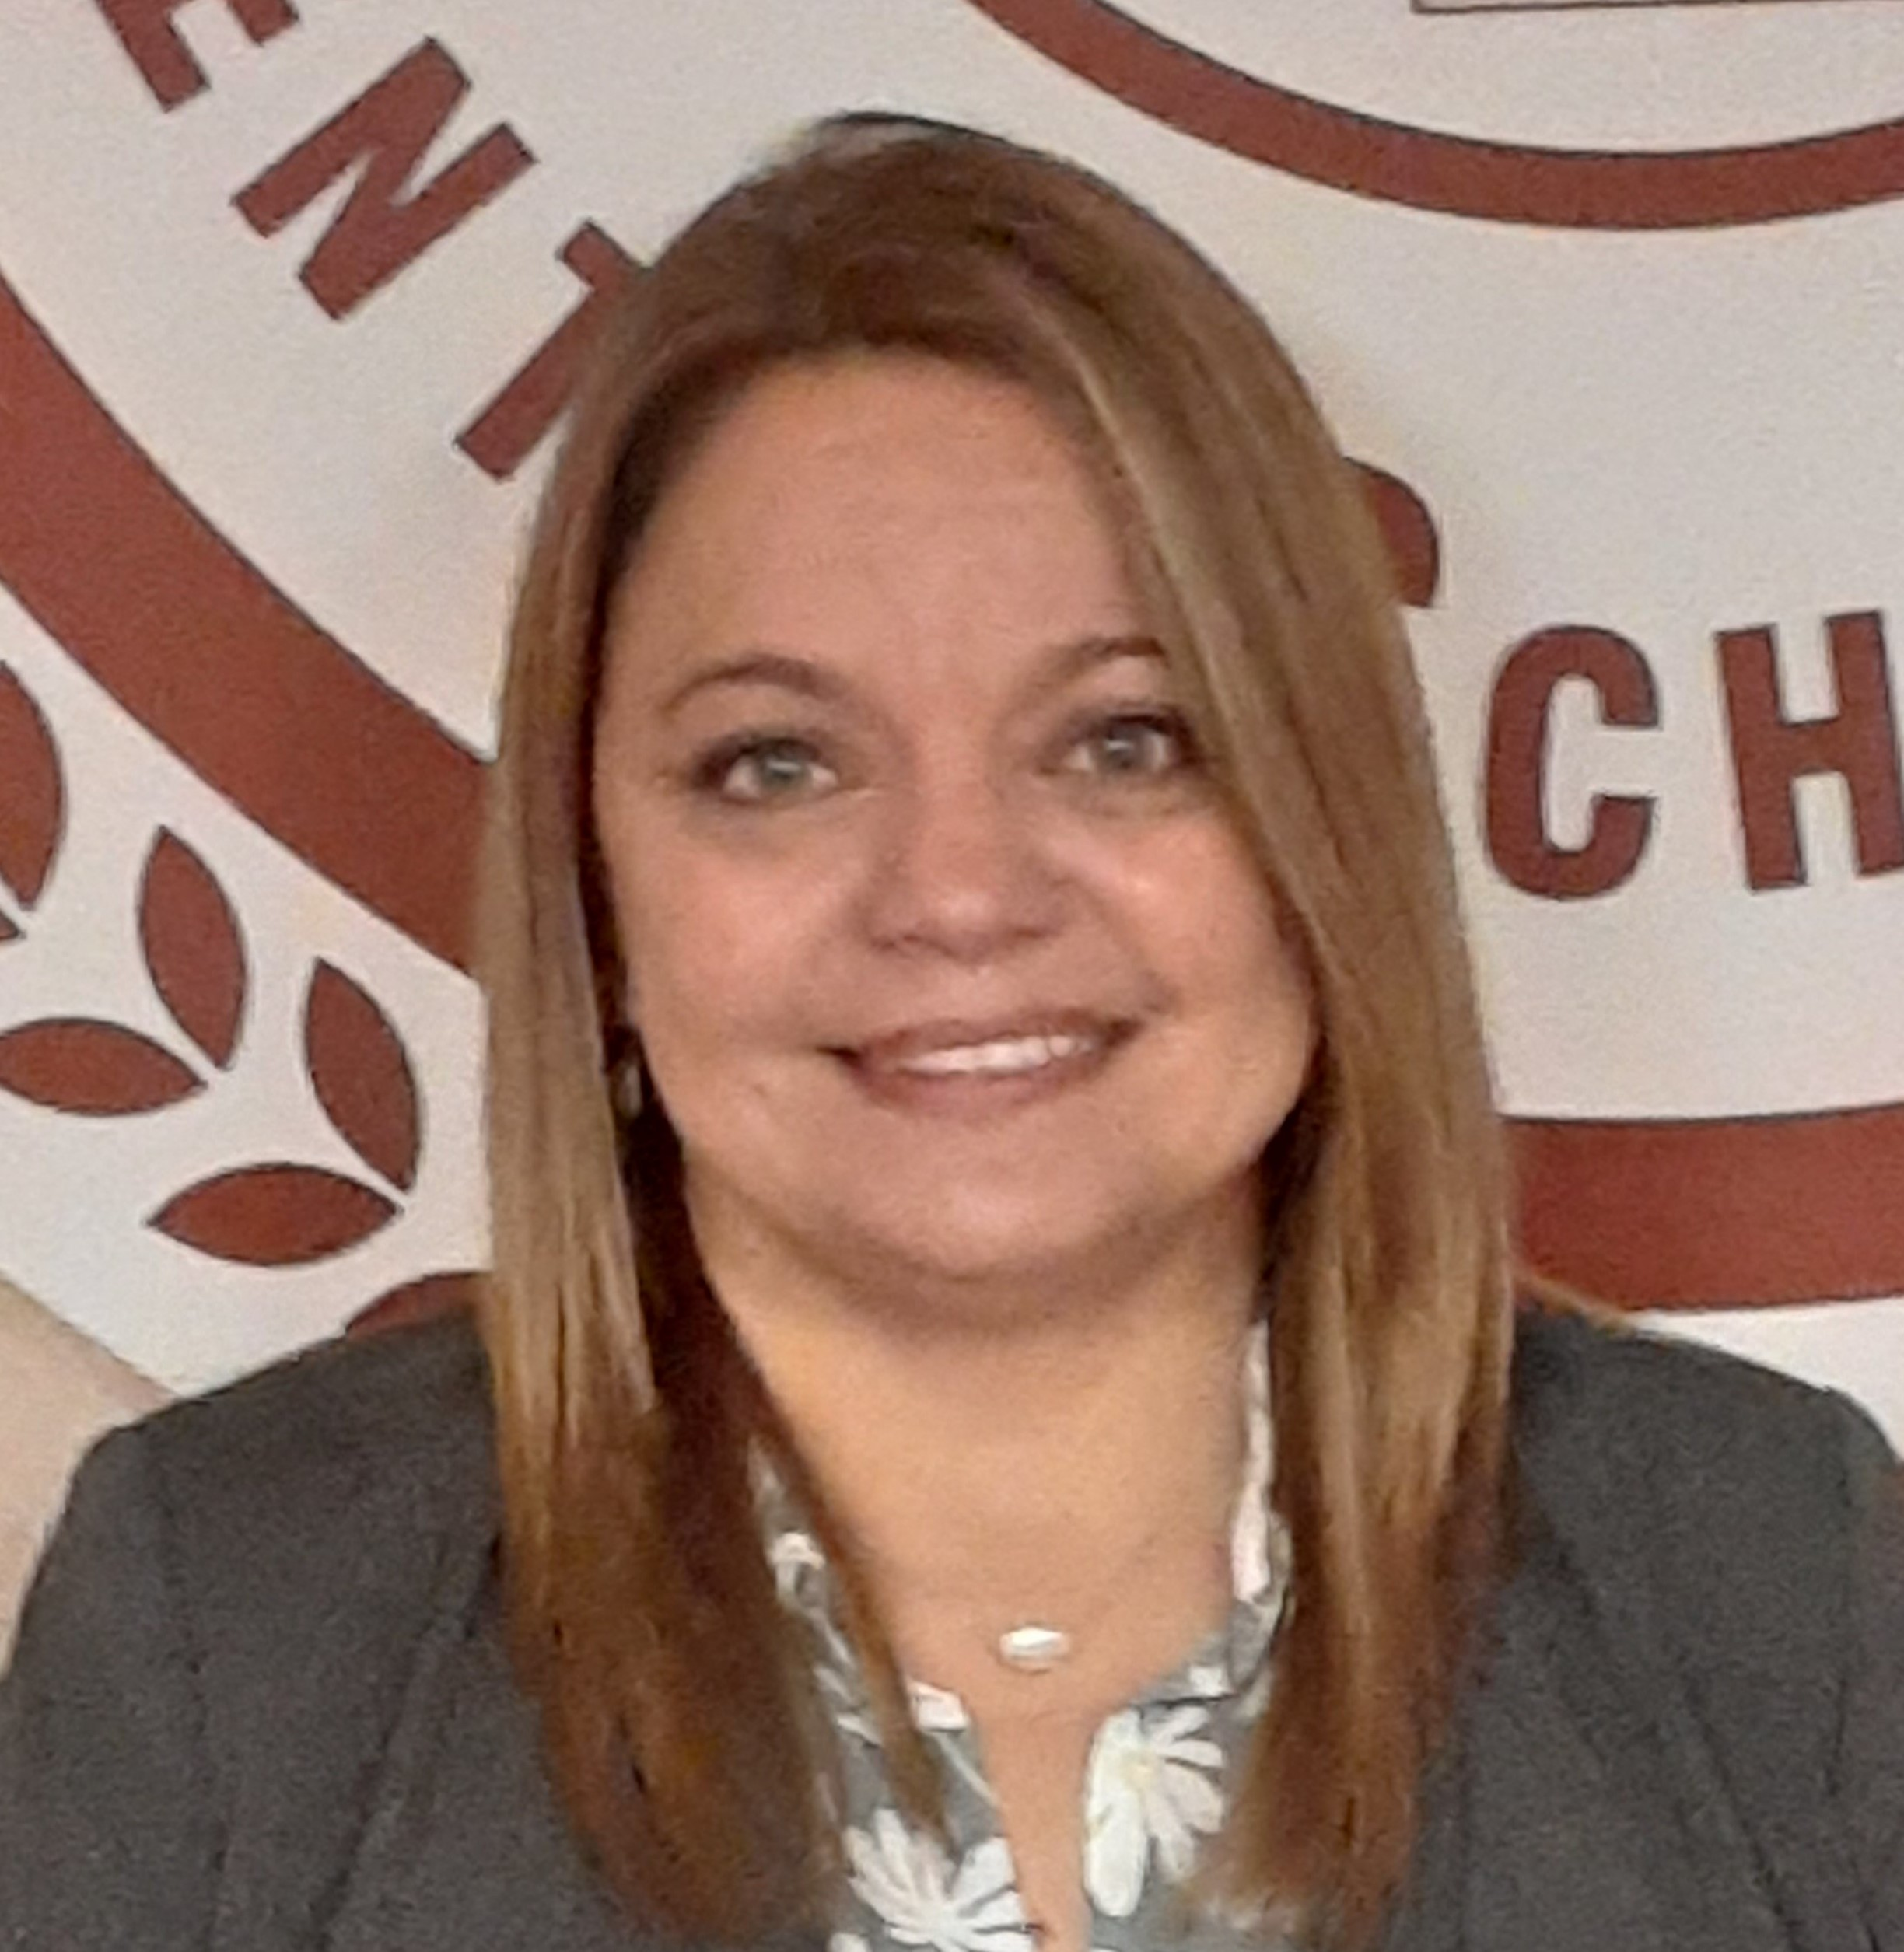 Executive Director of Human Resources